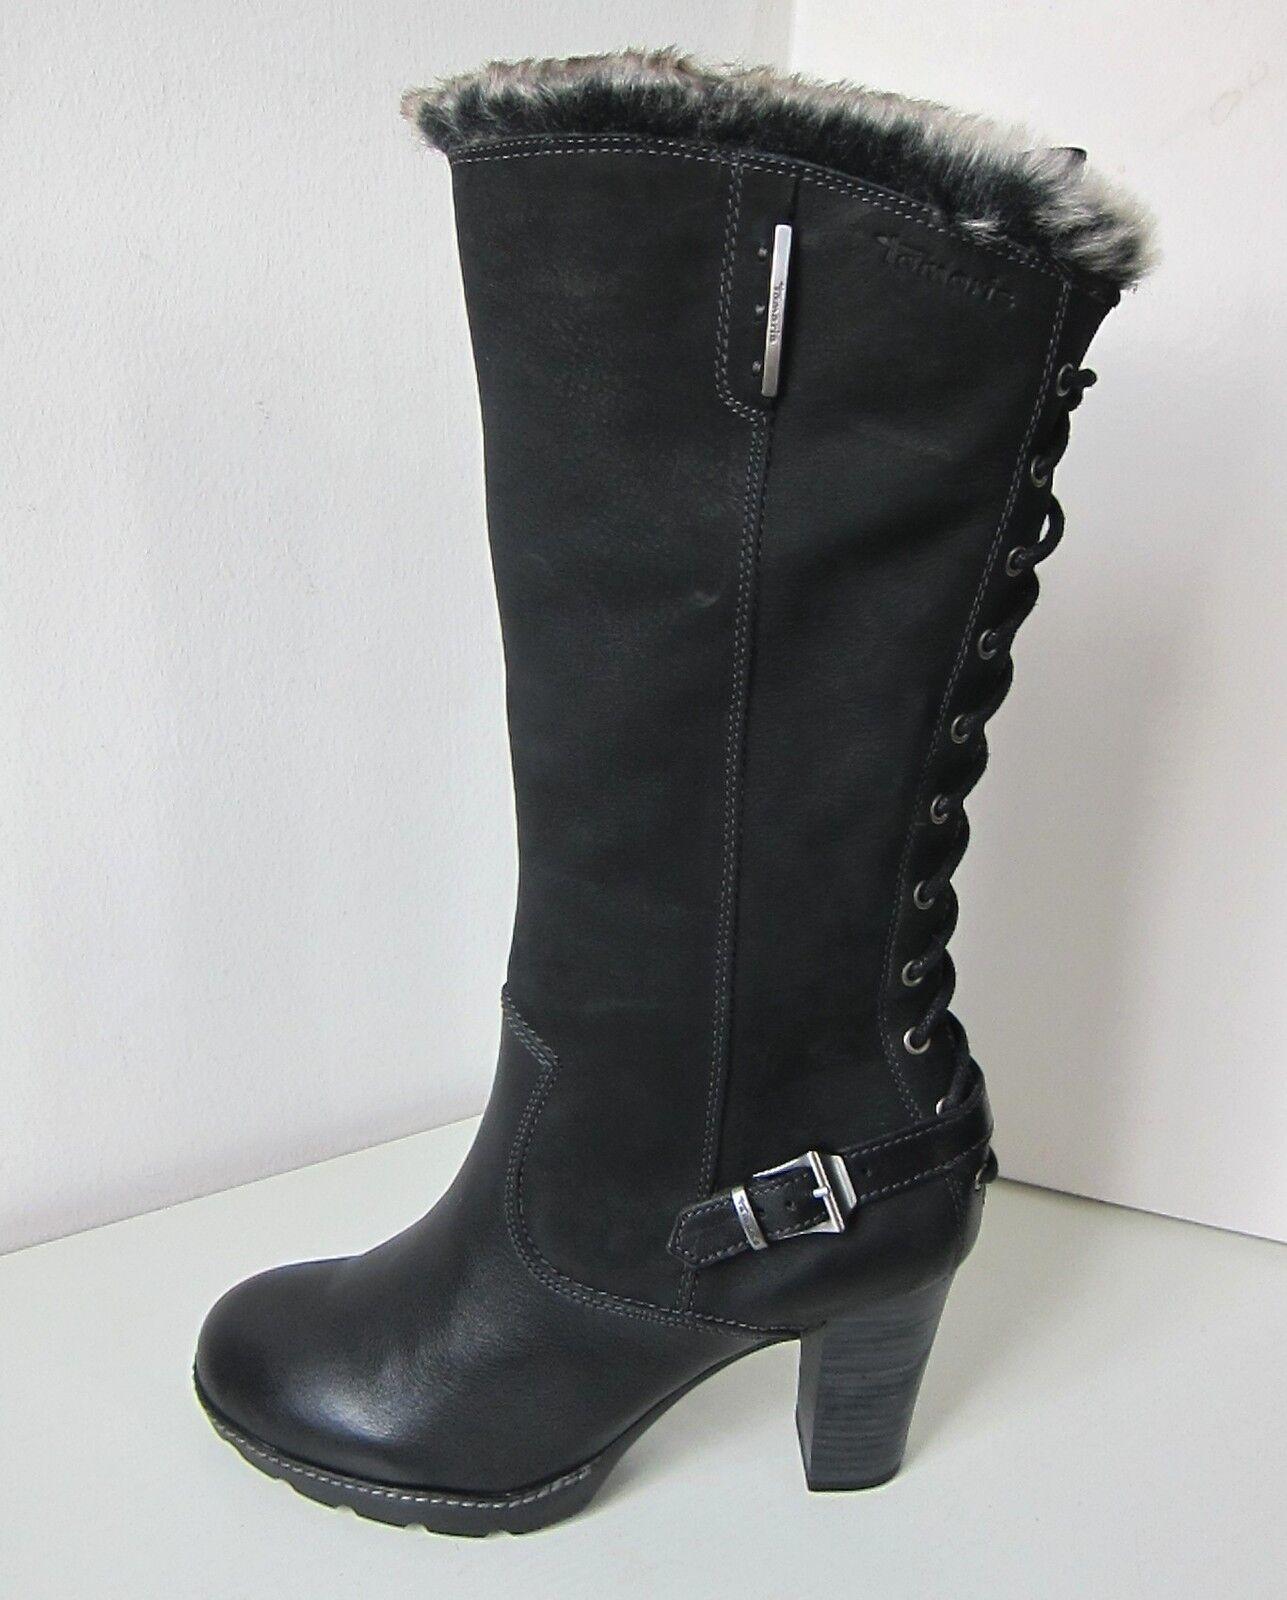 Tamaris vario botas negro Gr. 37 Boots Black Fake ancho fur M-XL